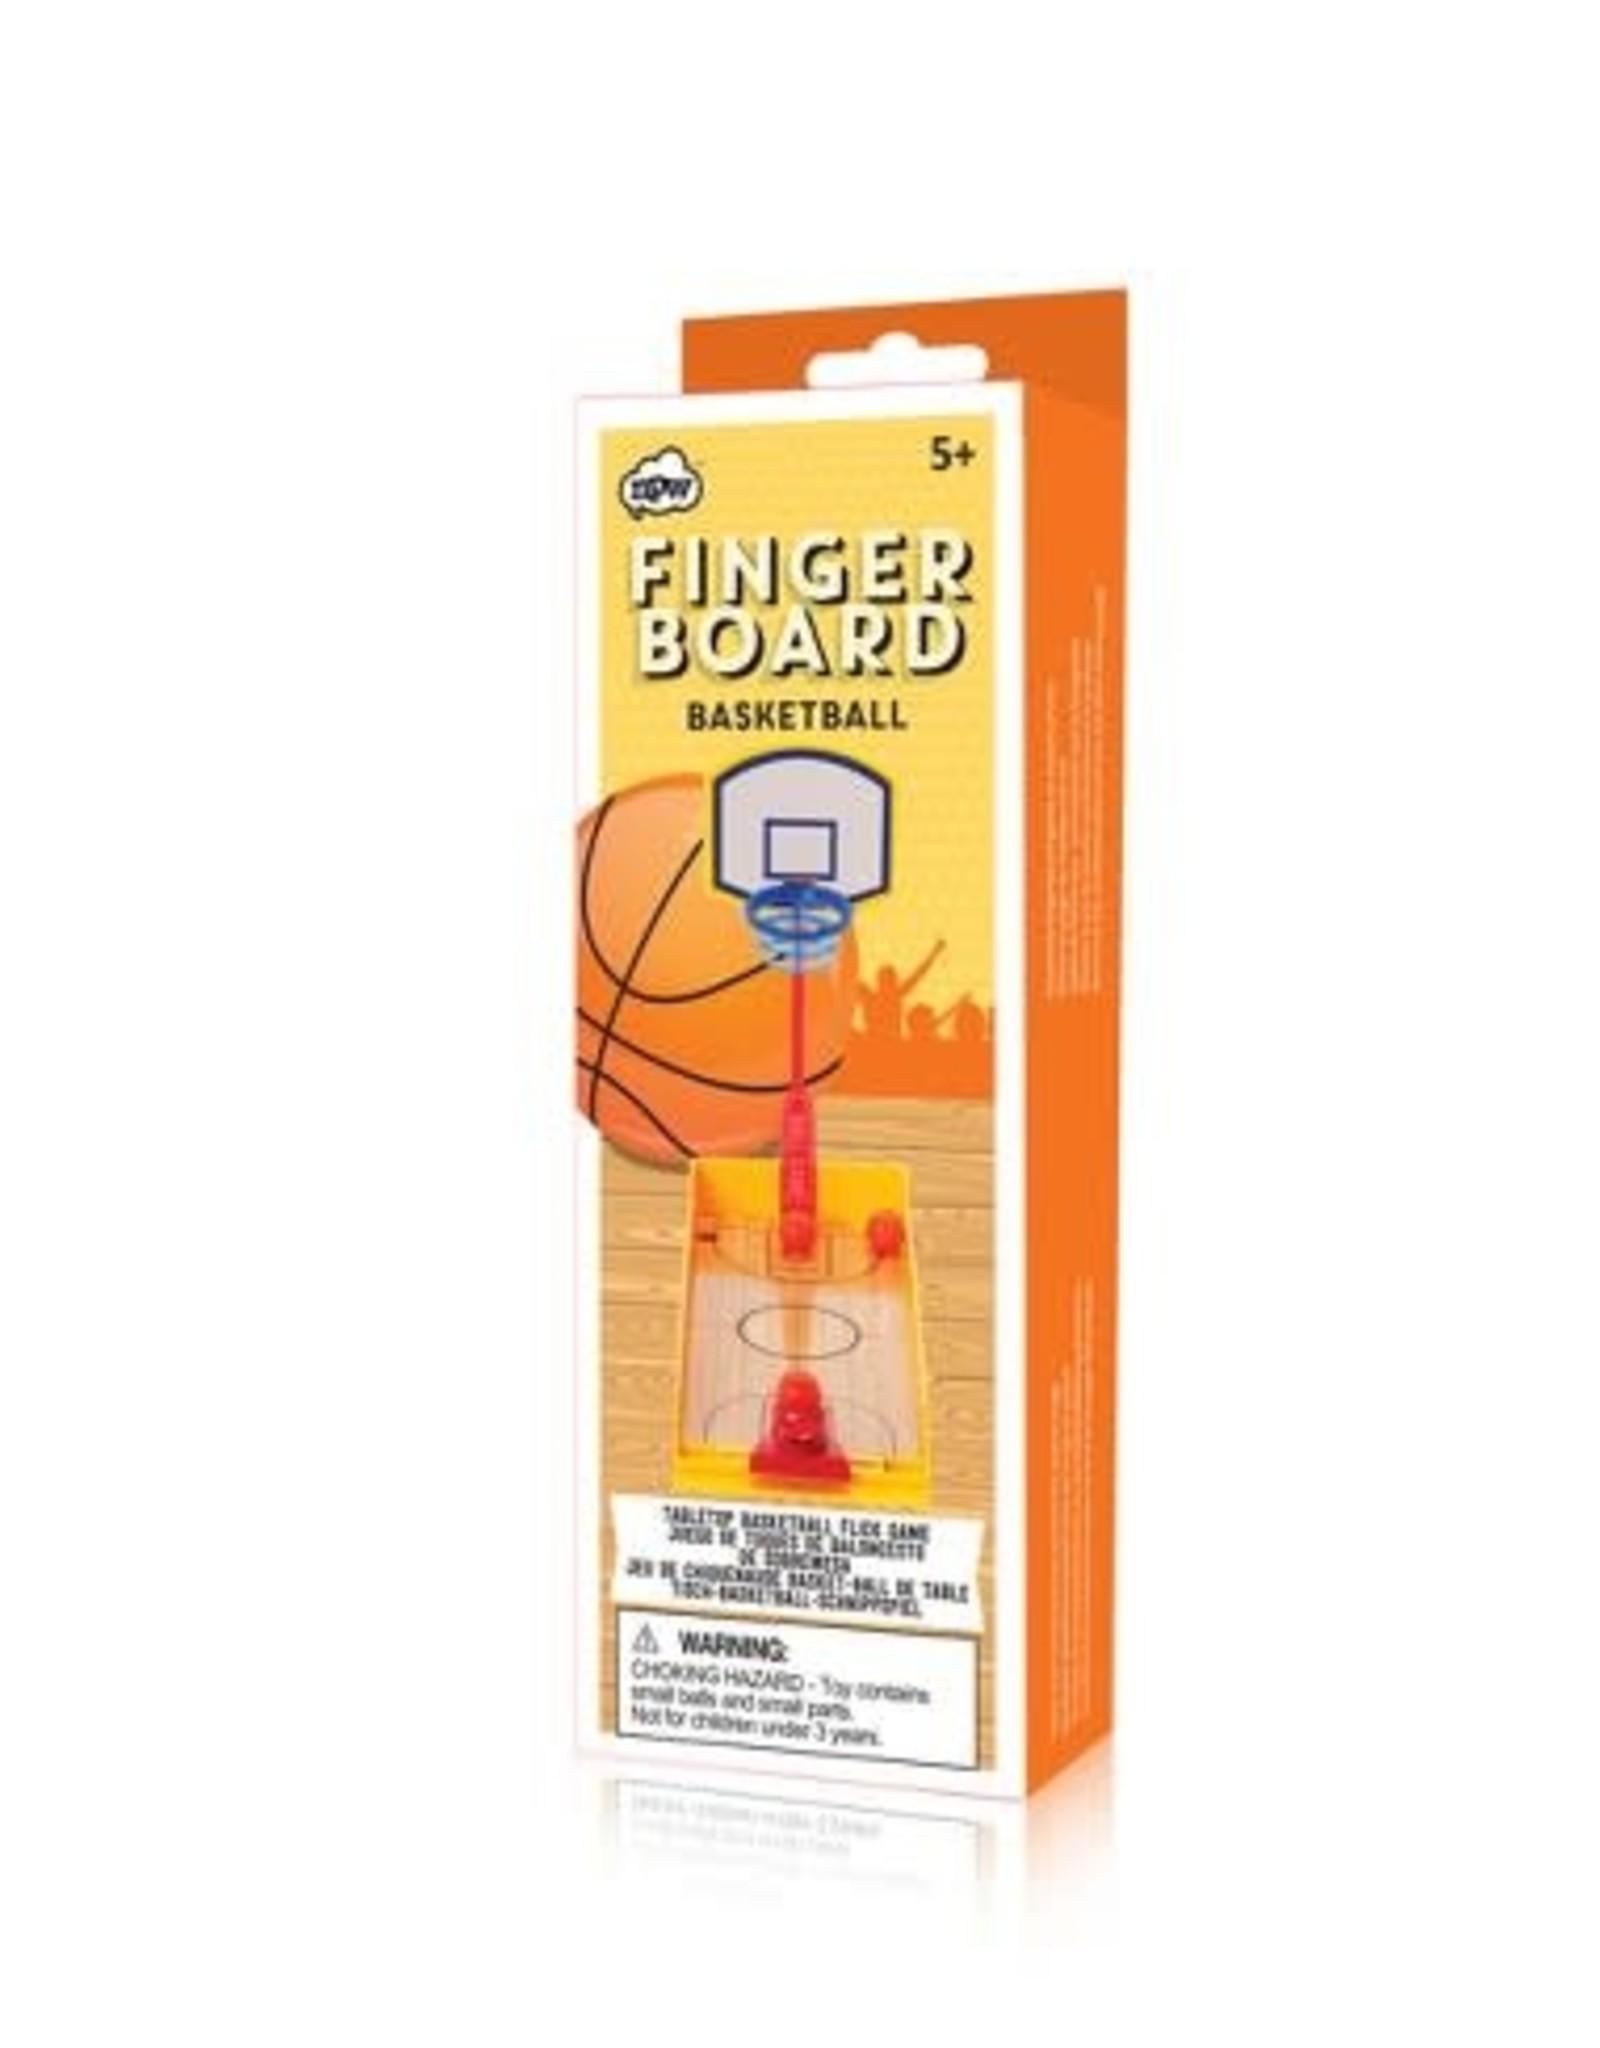 Fingerboard Basketball